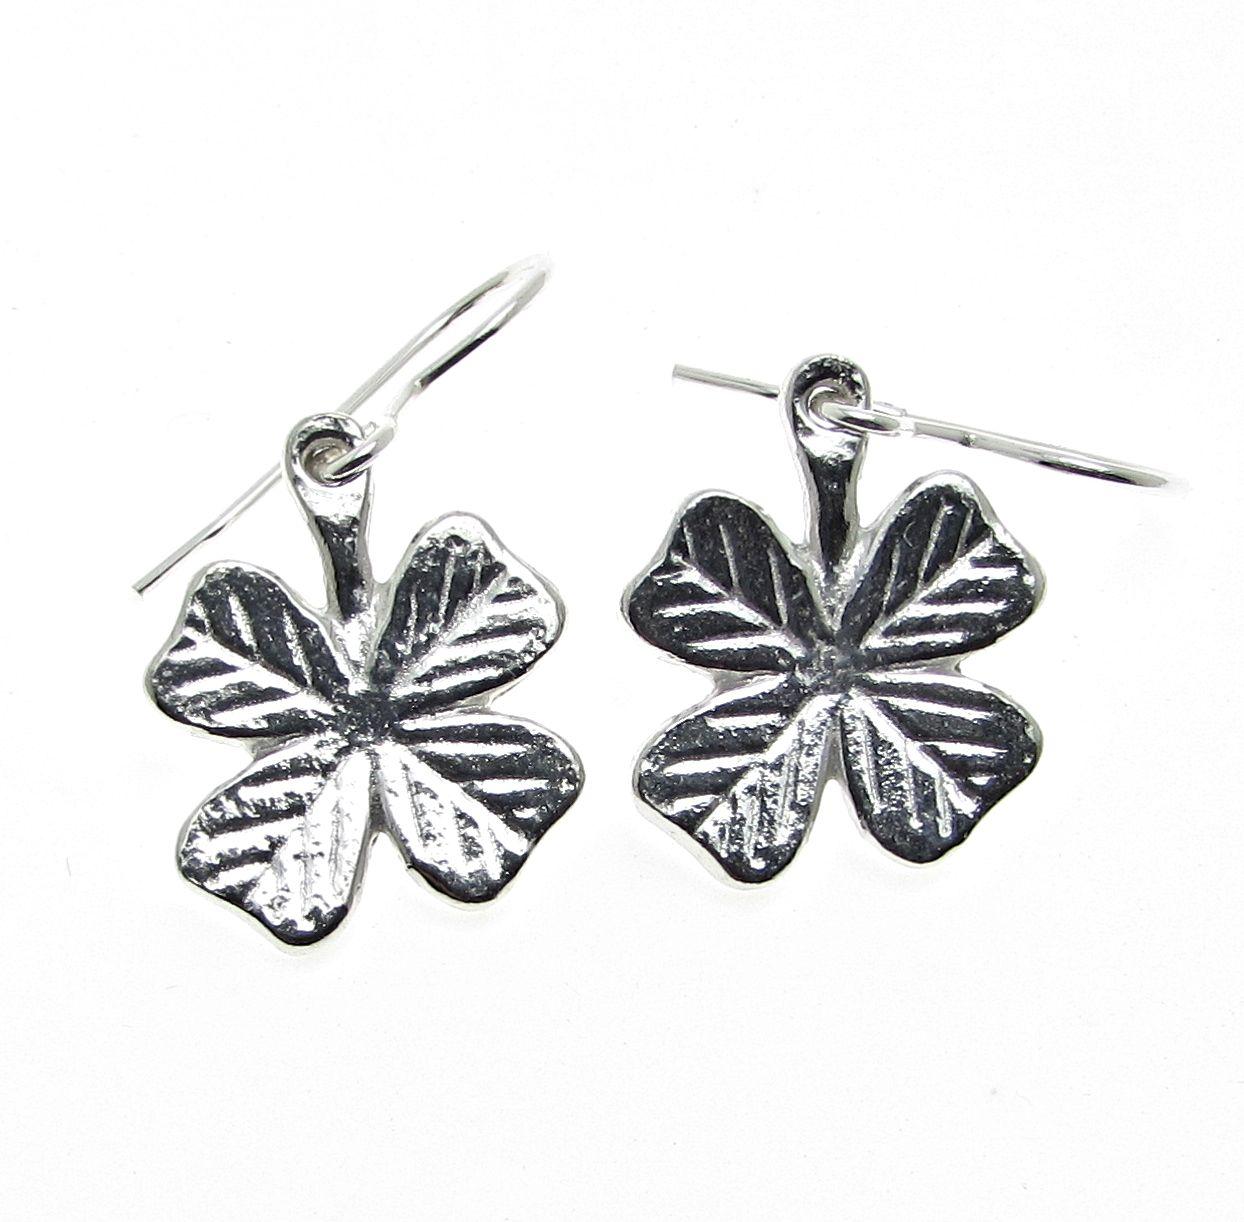 4 leaf clover earrings cast in Cornish tin